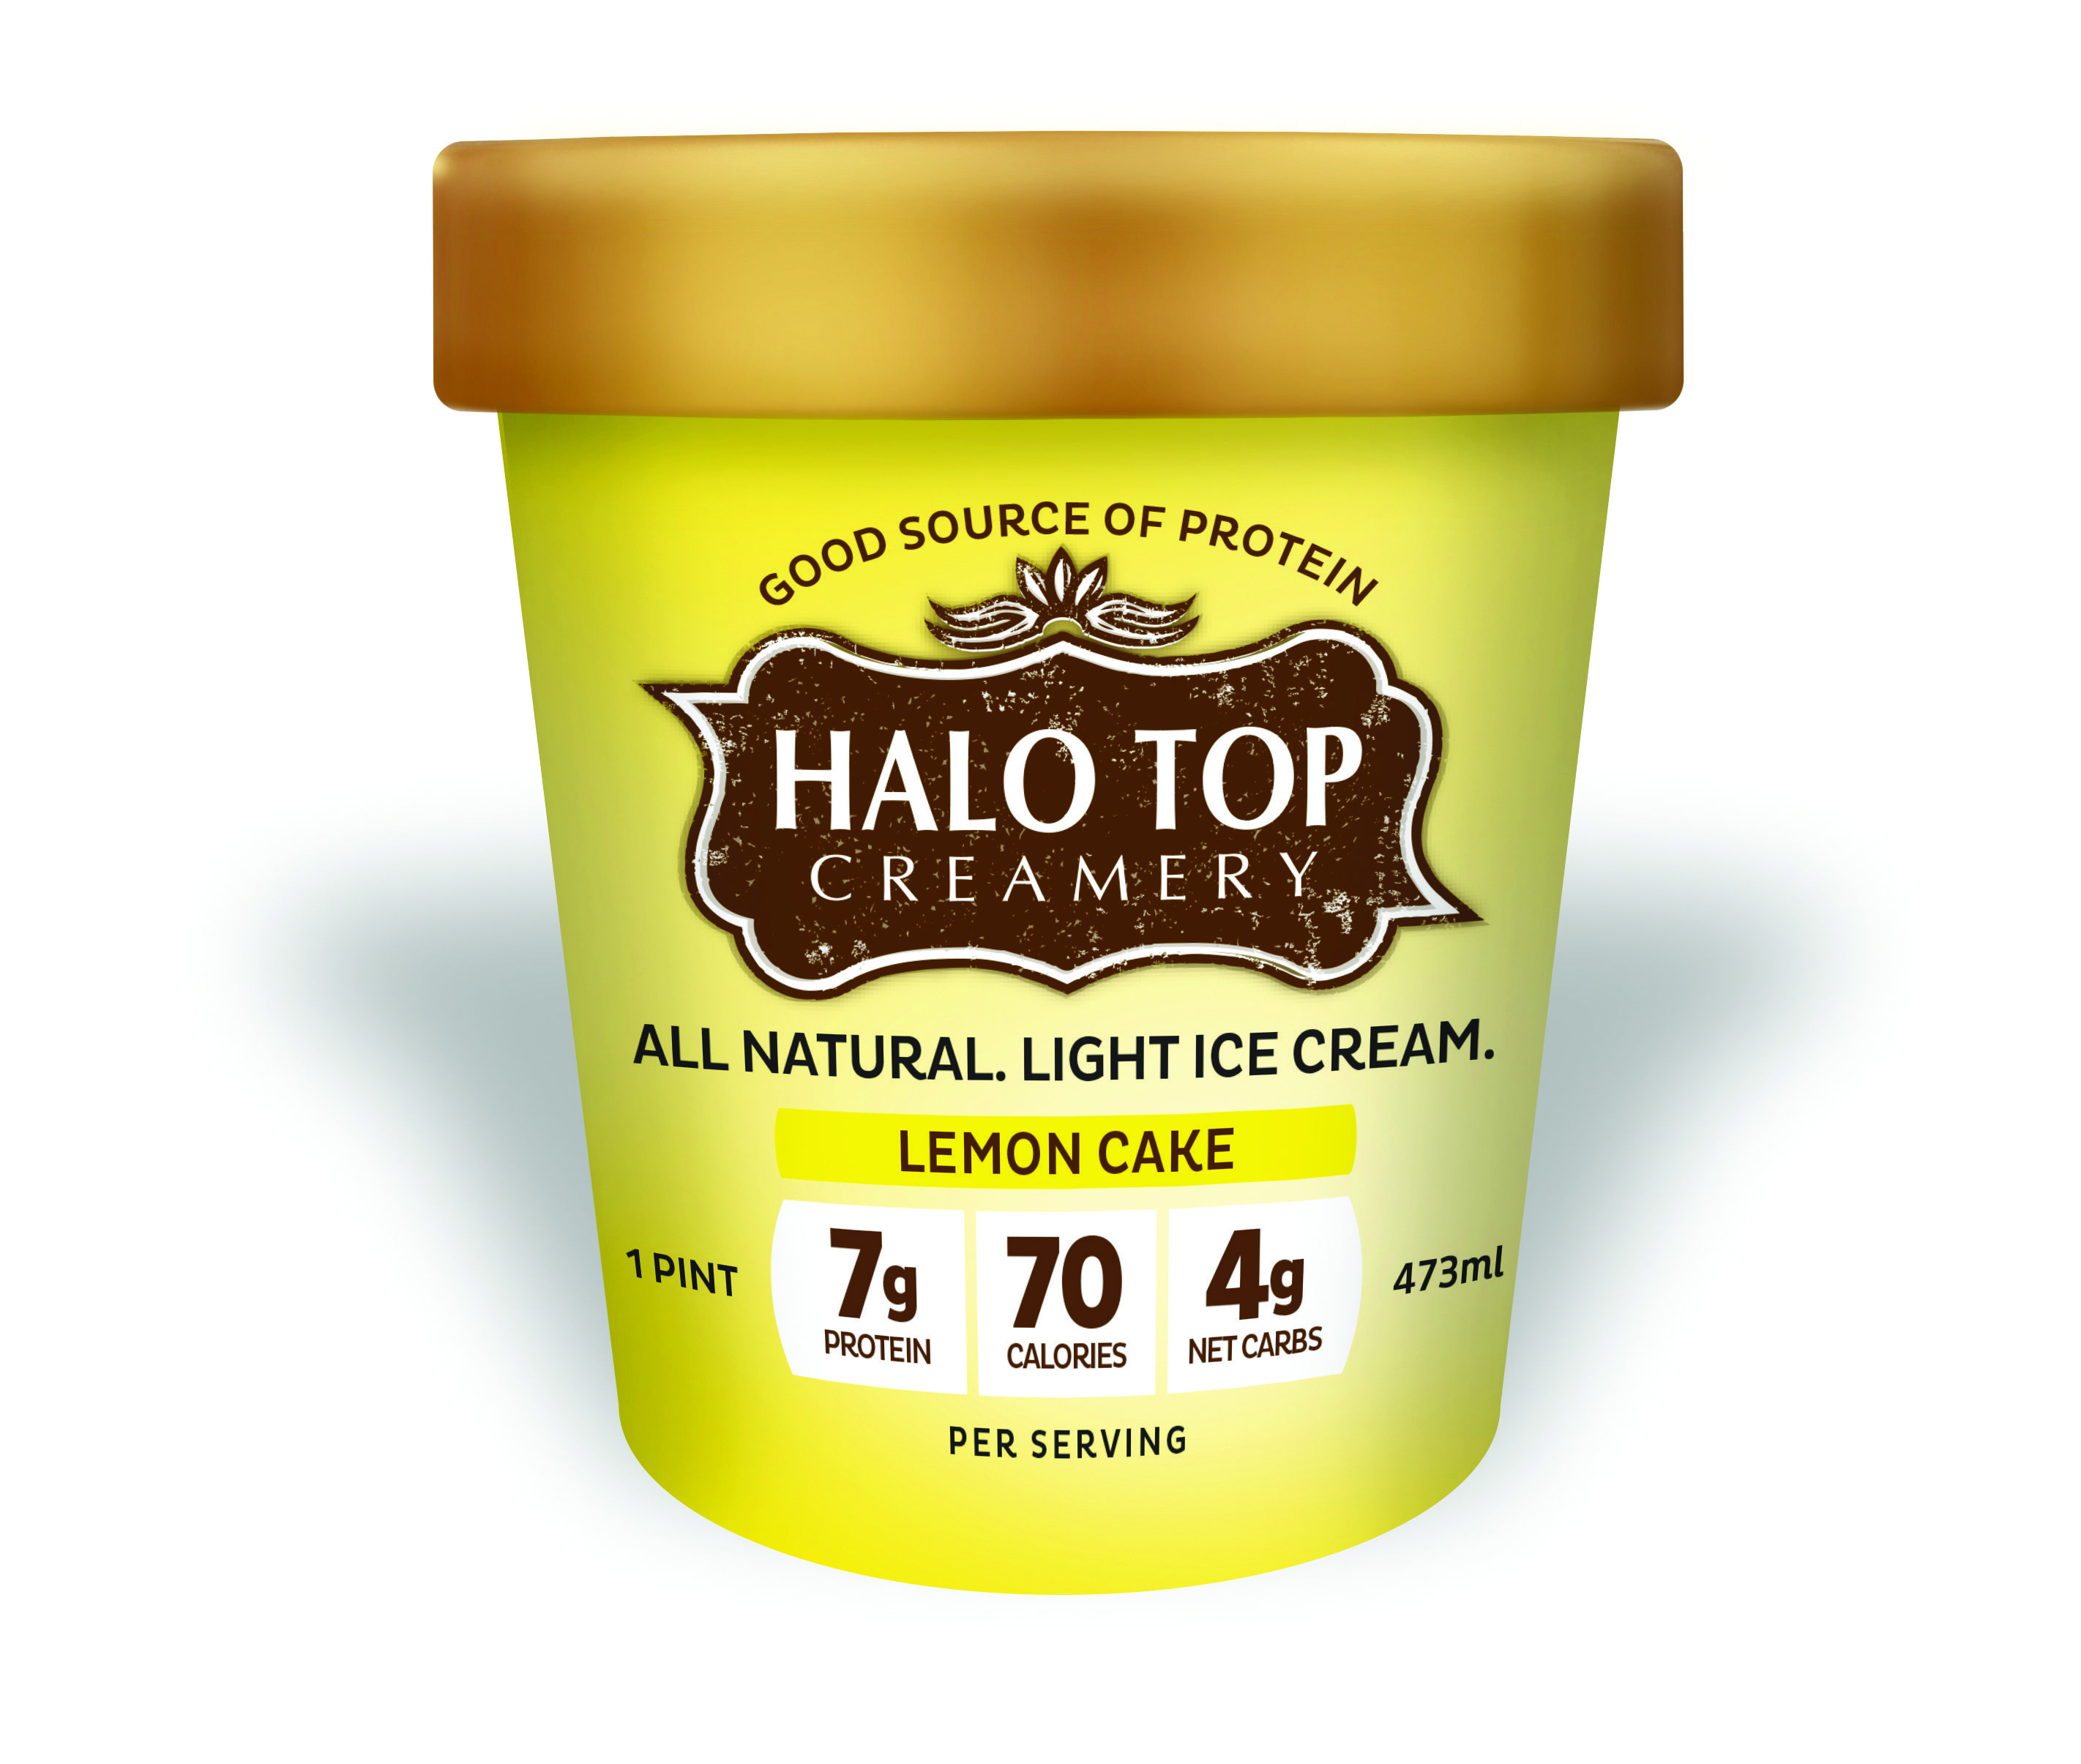 Halo Top Lemon Cake ice cream has the perfect amount of zesty